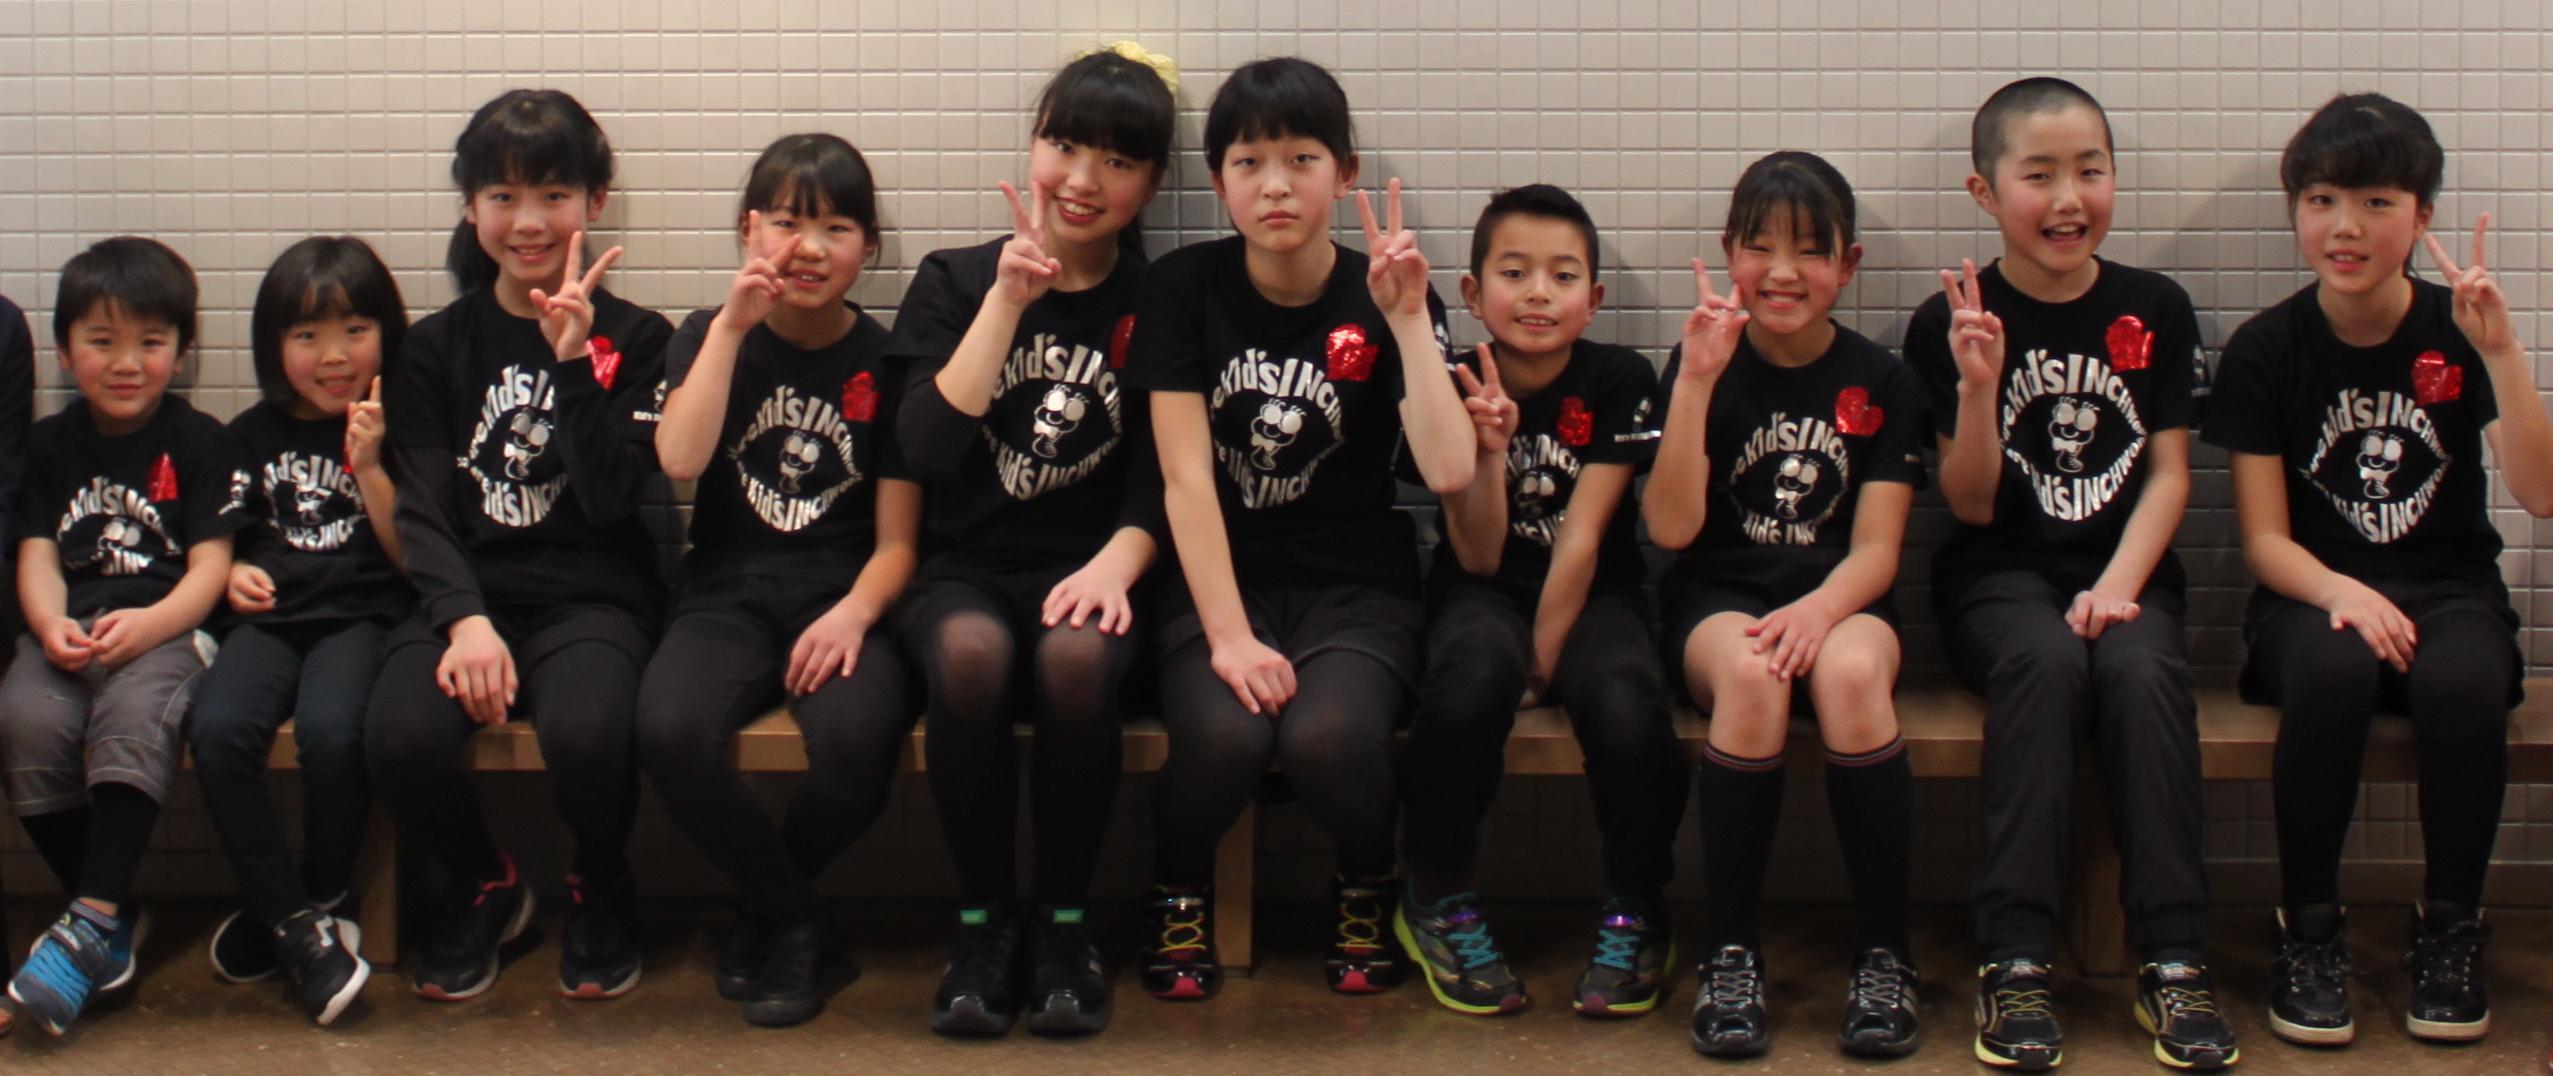 2011.10.02 fukky&emi先生と